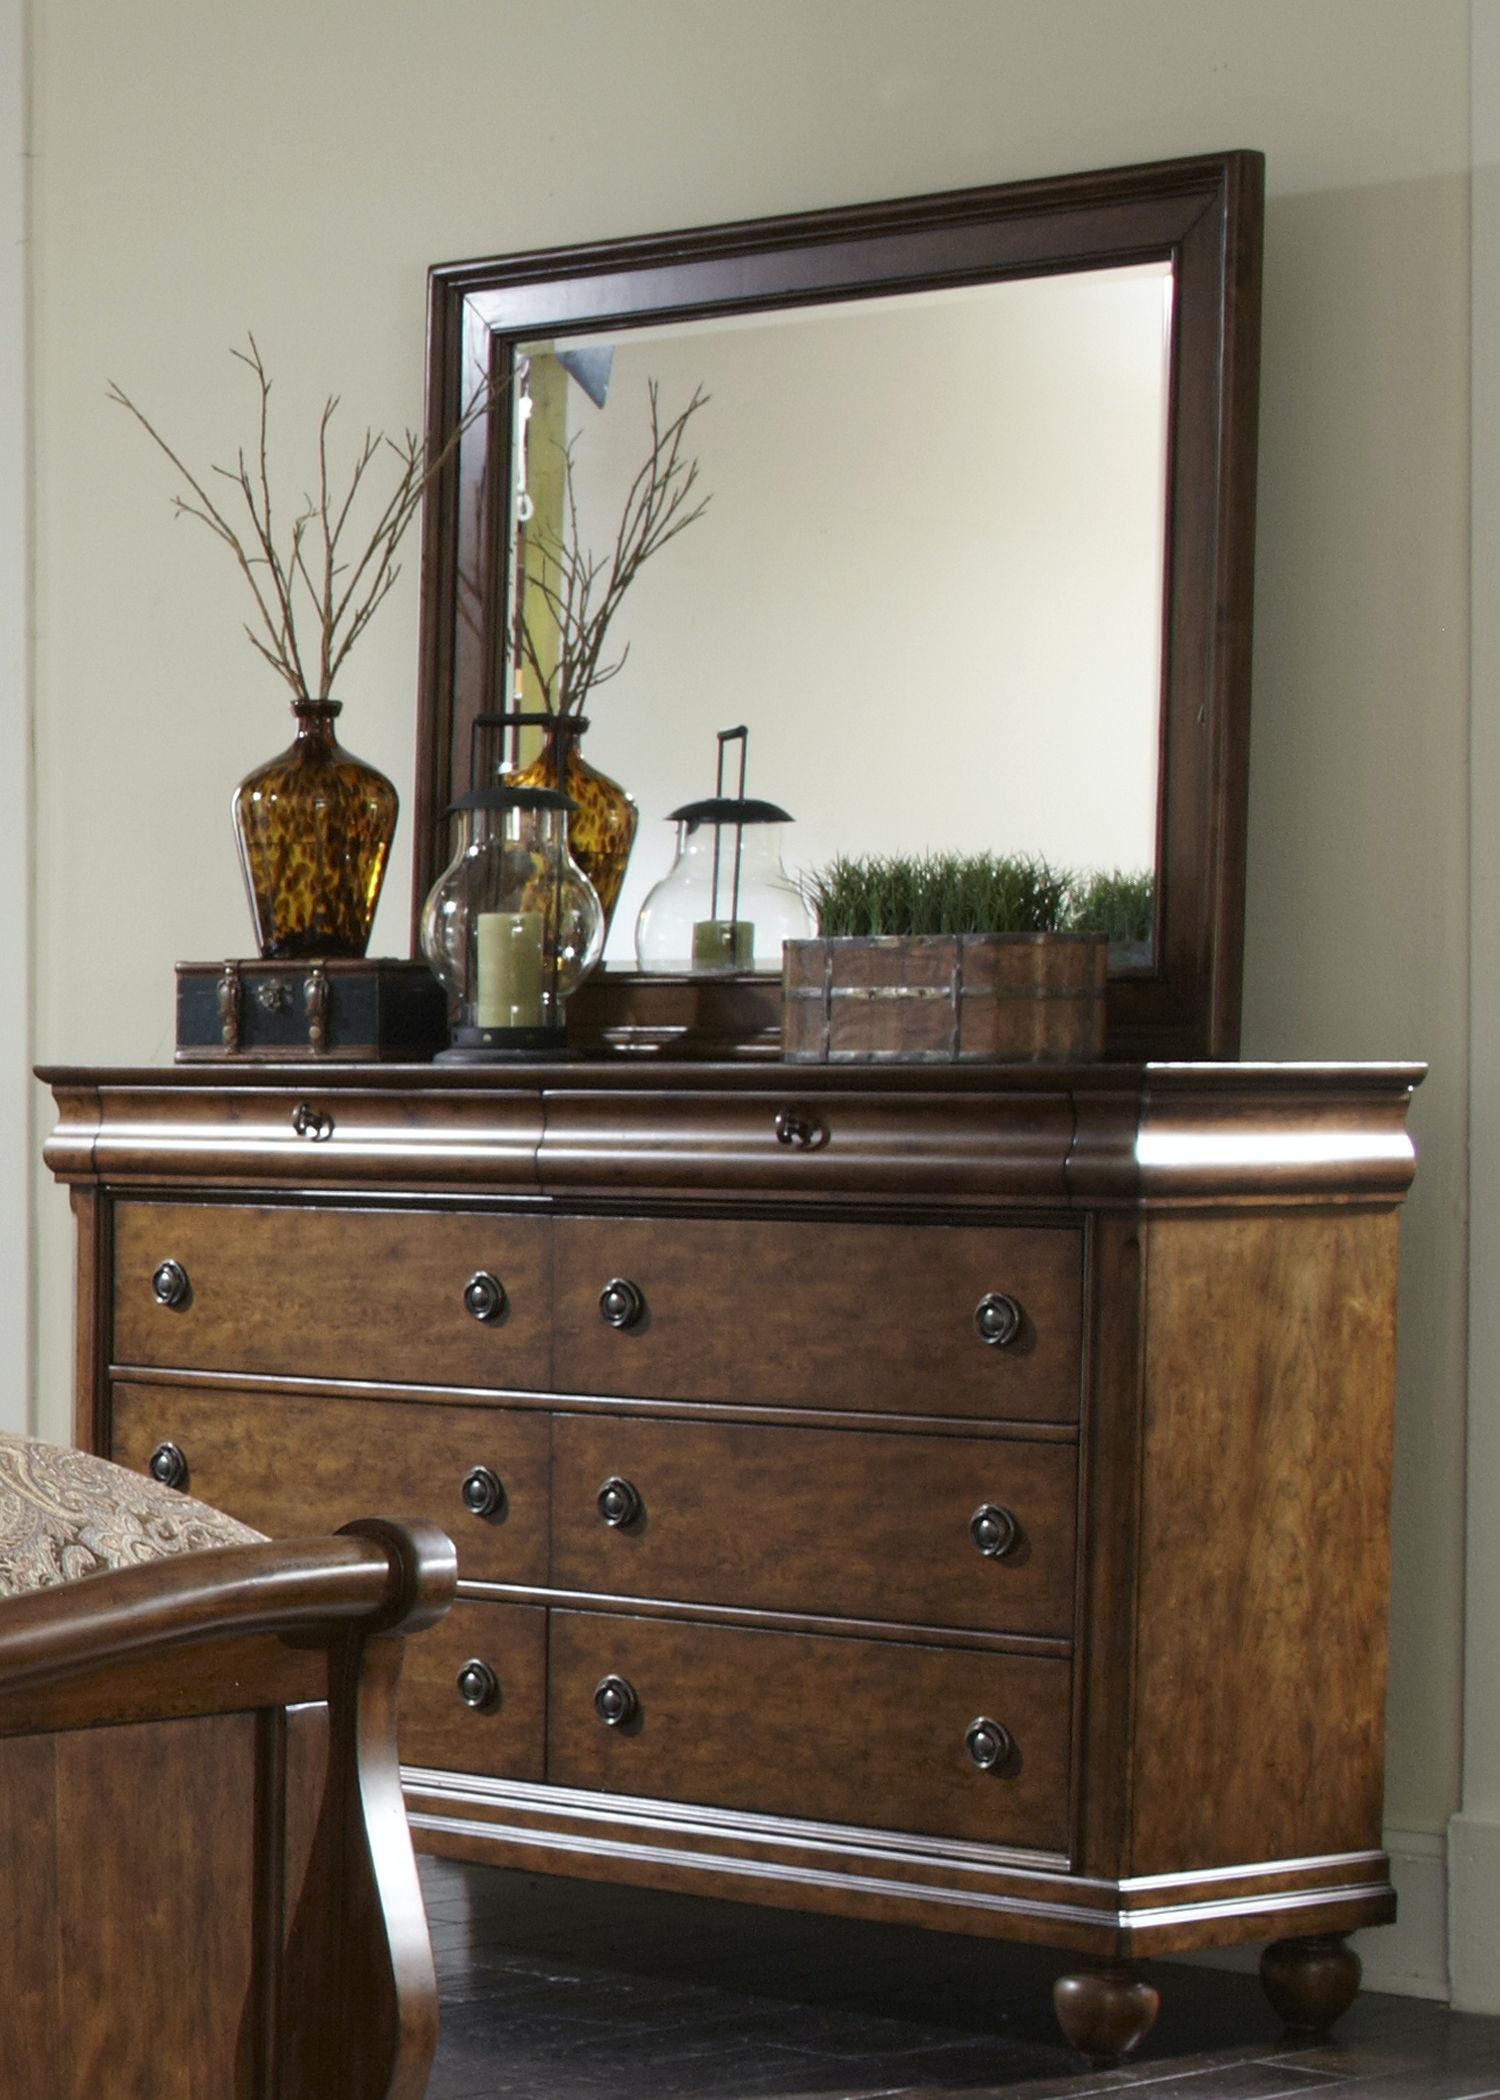 Liberty Furniture Accessories Landscape Mirror 589 BR51 At Smith Village  Home Furniture